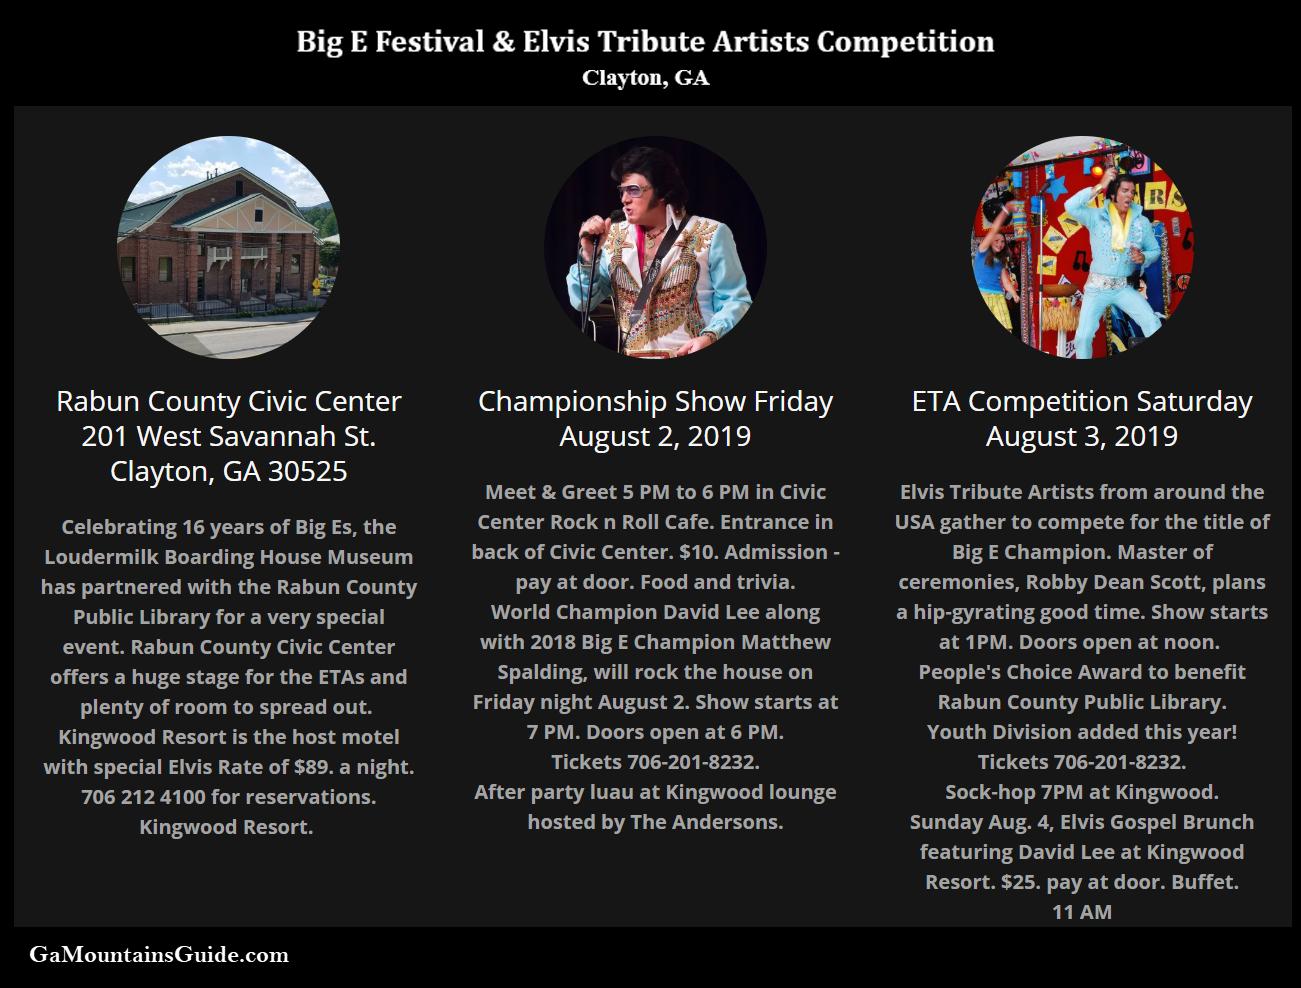 Annual-Big-E-Festival-Elvis-Tribute-Artists-Competition